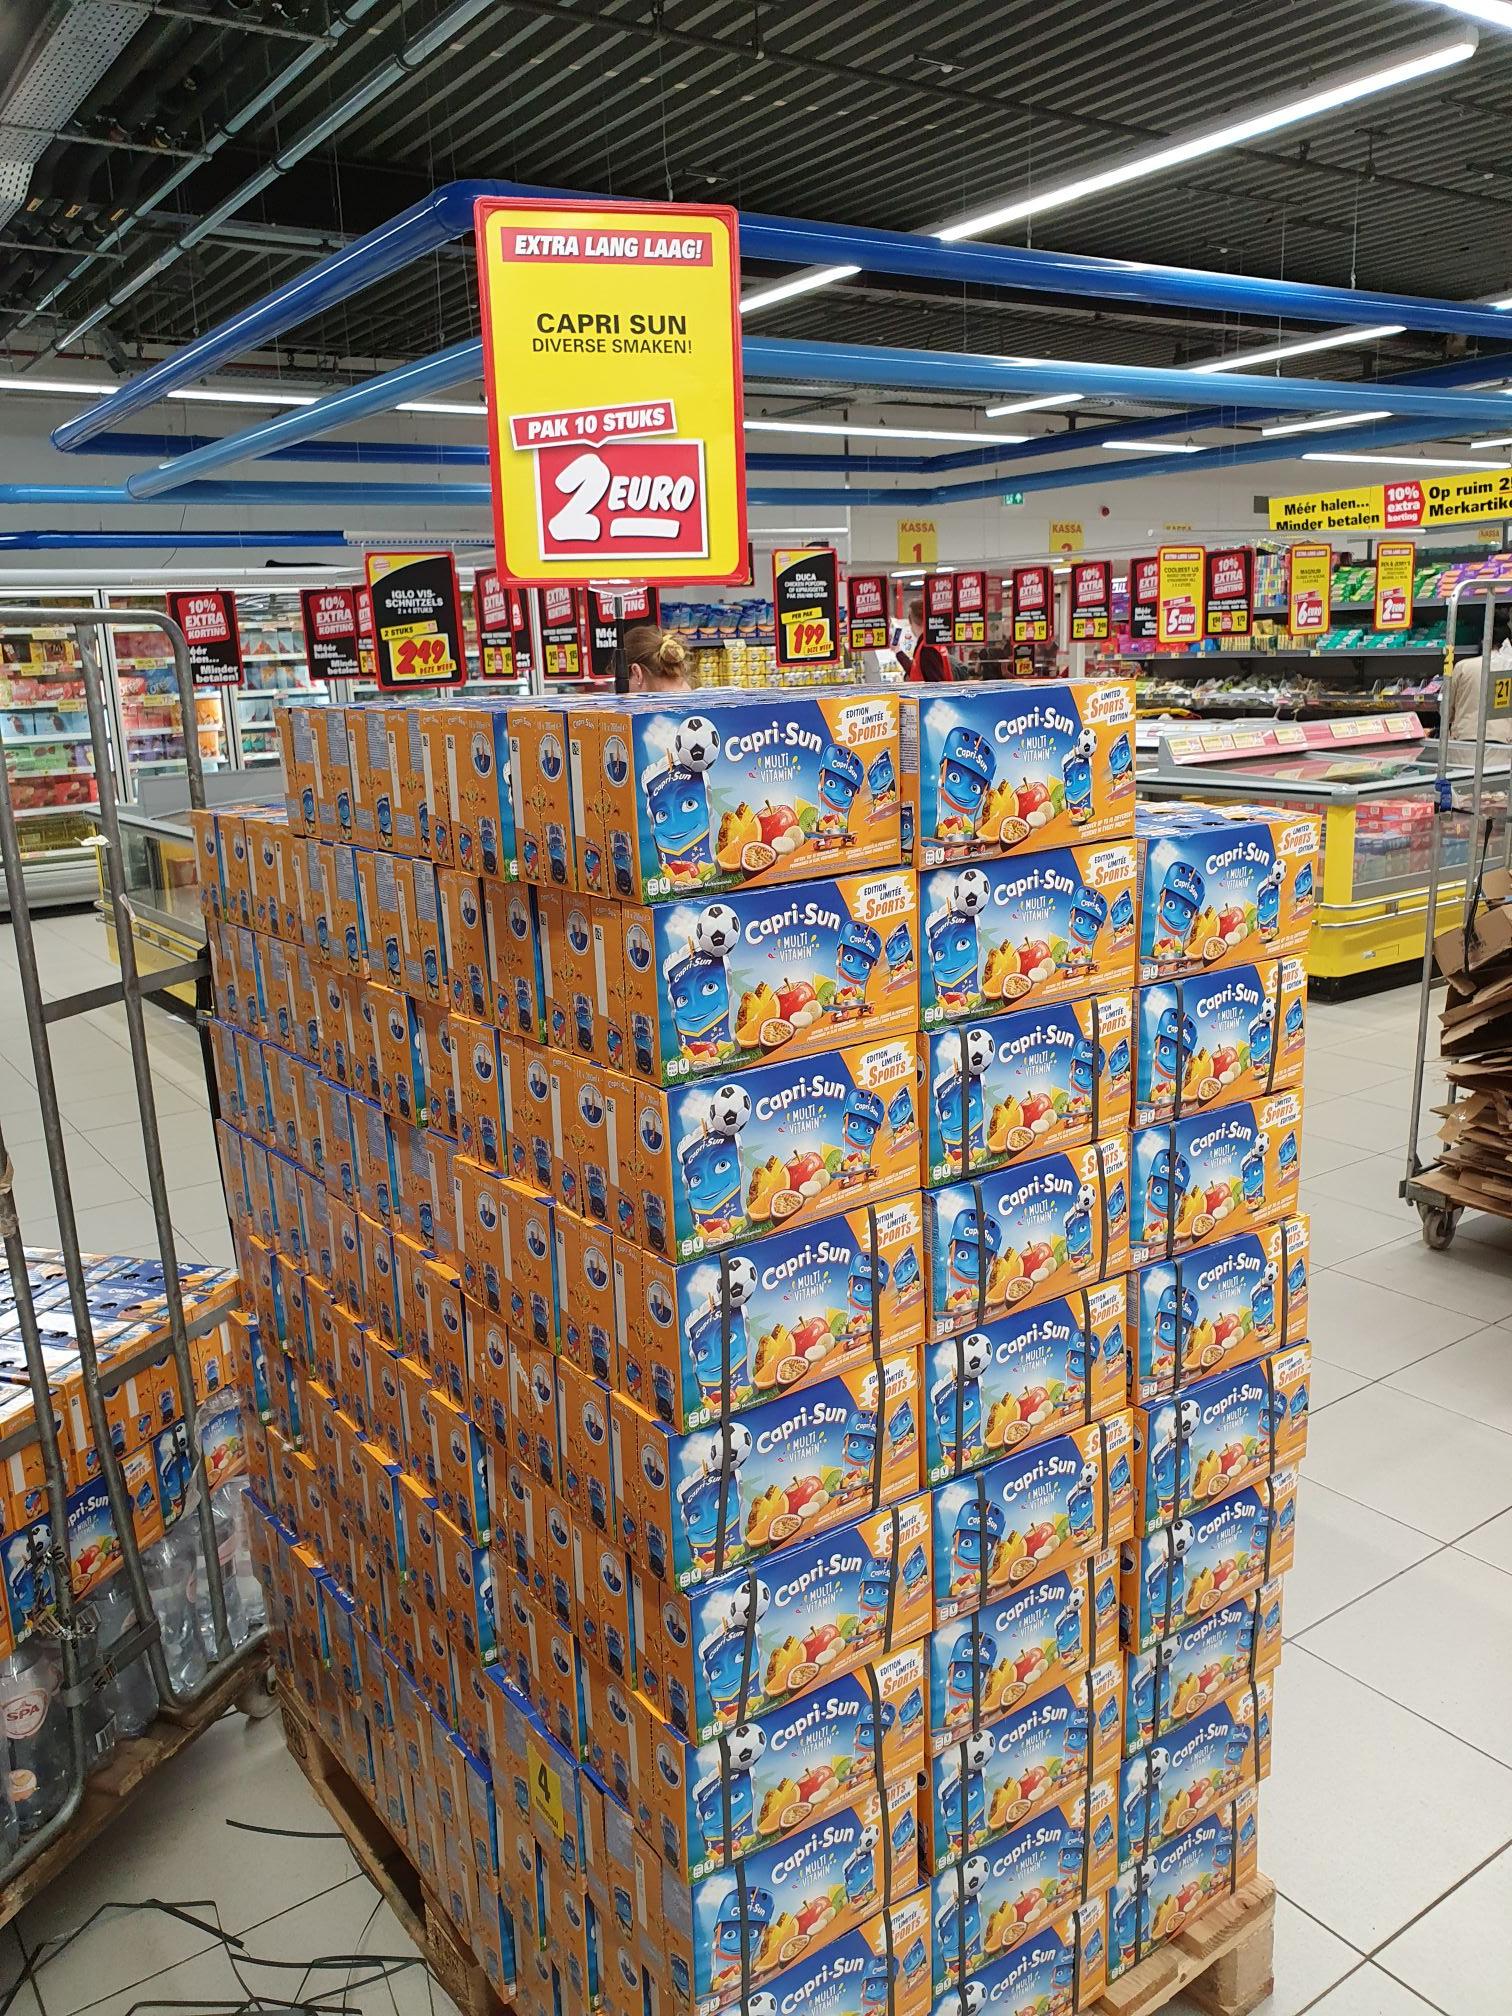 10 pakjes Capri-sun voor slechts 2 euro! @ Nettorama